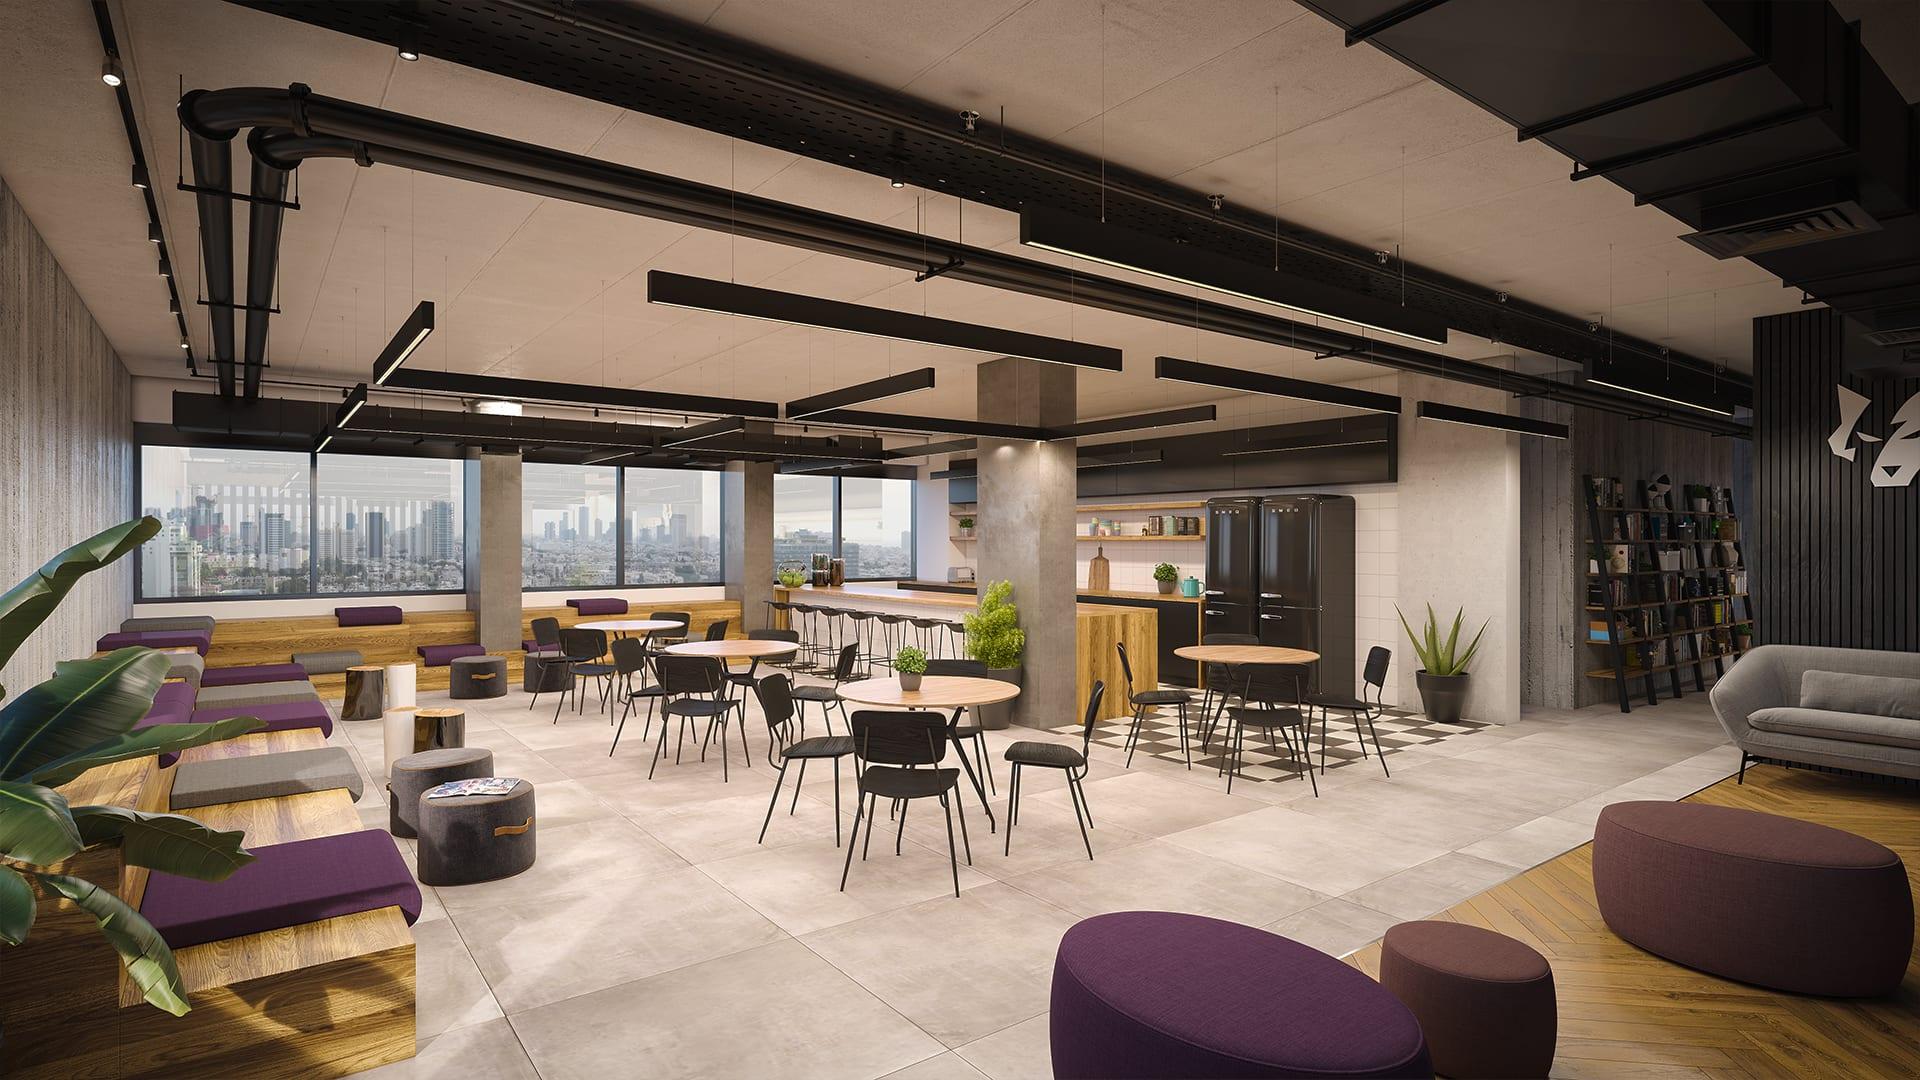 Maayan-Golan_Architectural-Visualization_interior-design-visualization_office-space_kitchen_switchup_03